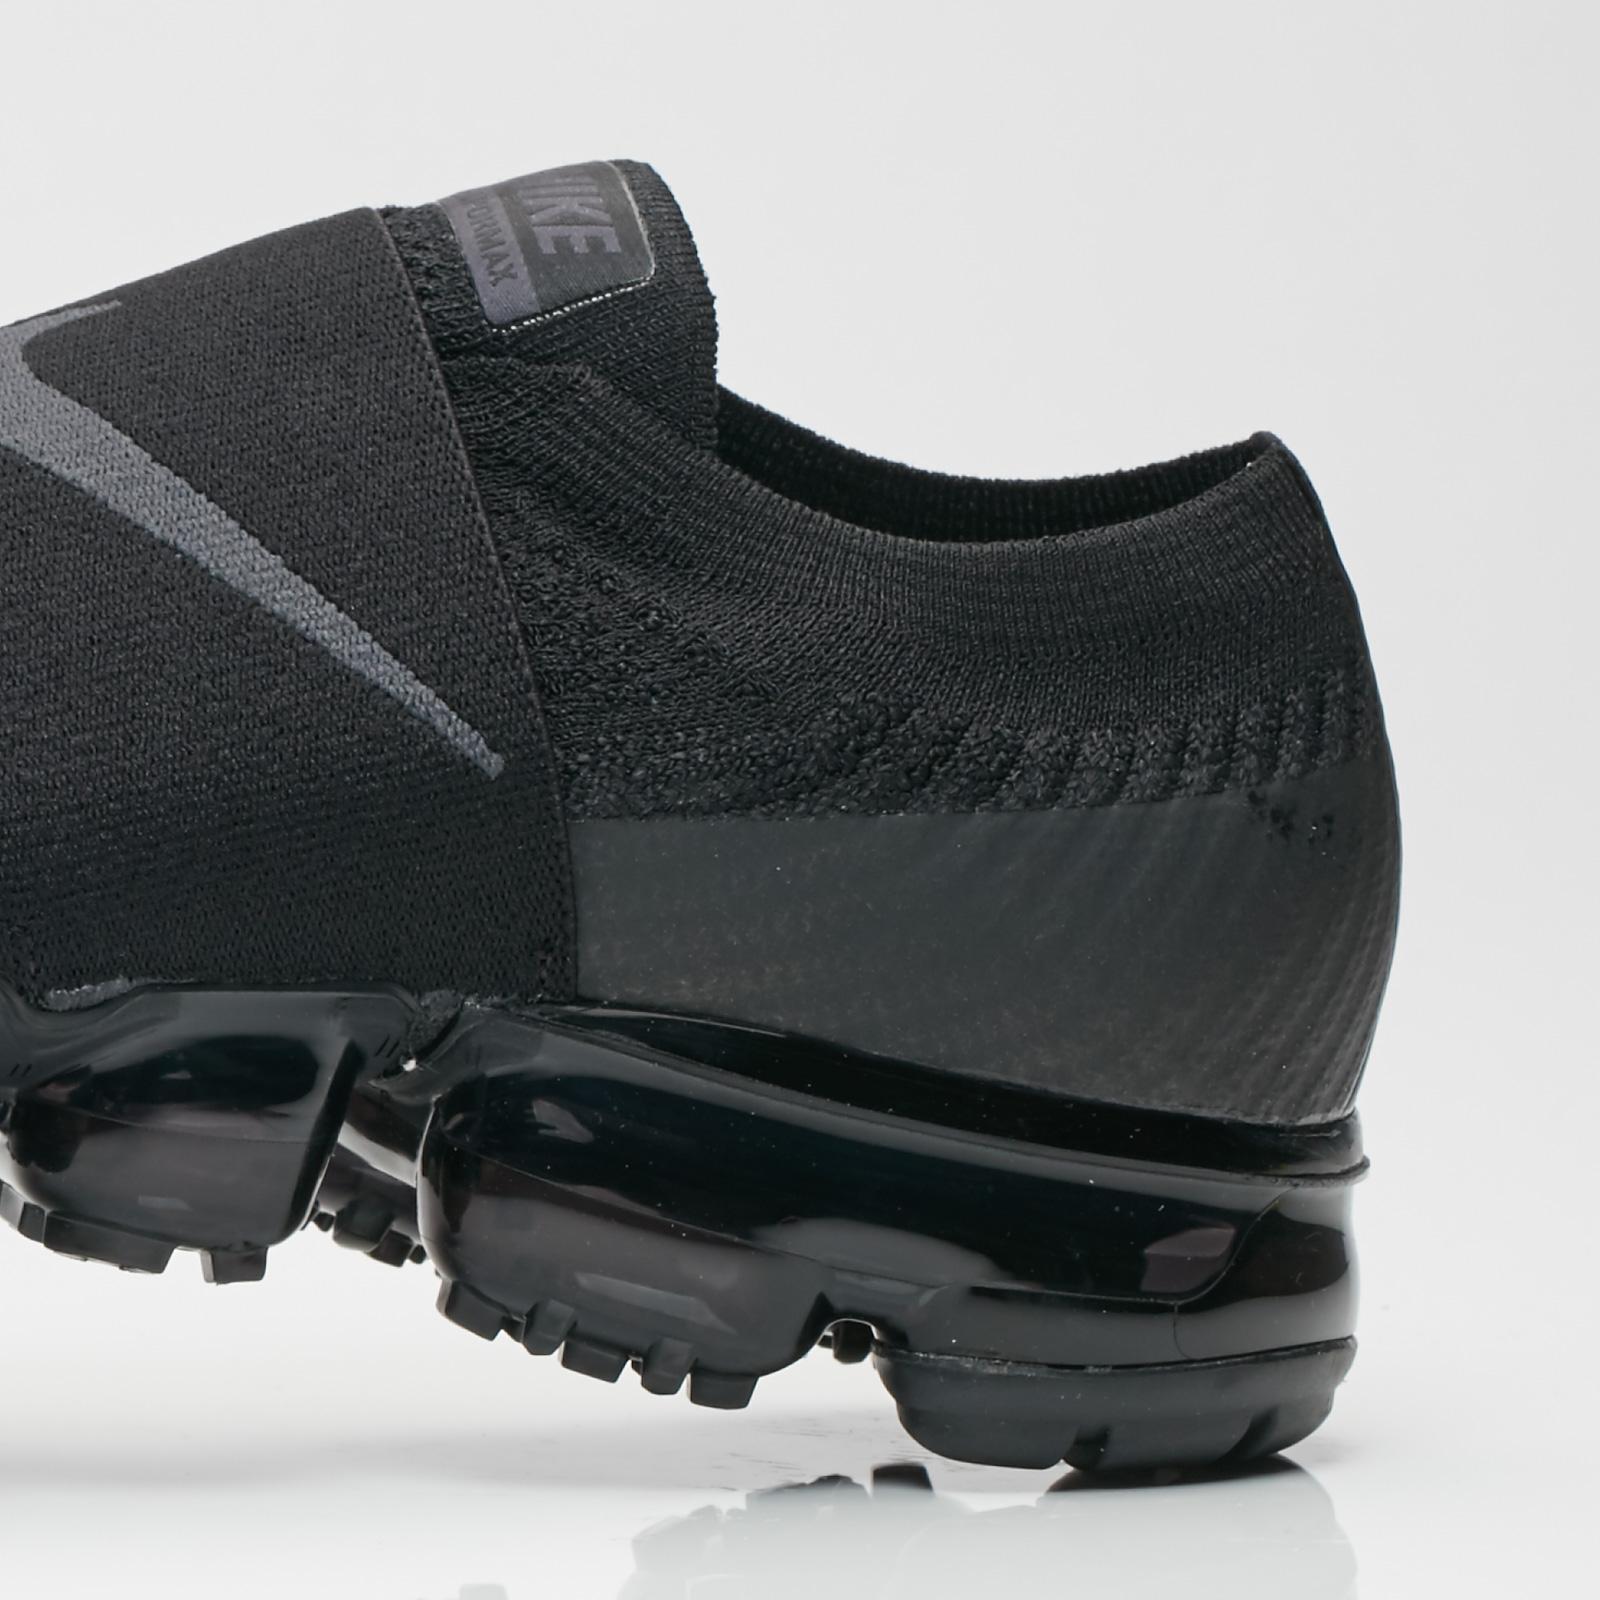 fe7bdc22cc2 Nike Wmns Air Vapormax Flyknit MOC - Aa4155-004 - Sneakersnstuff ...